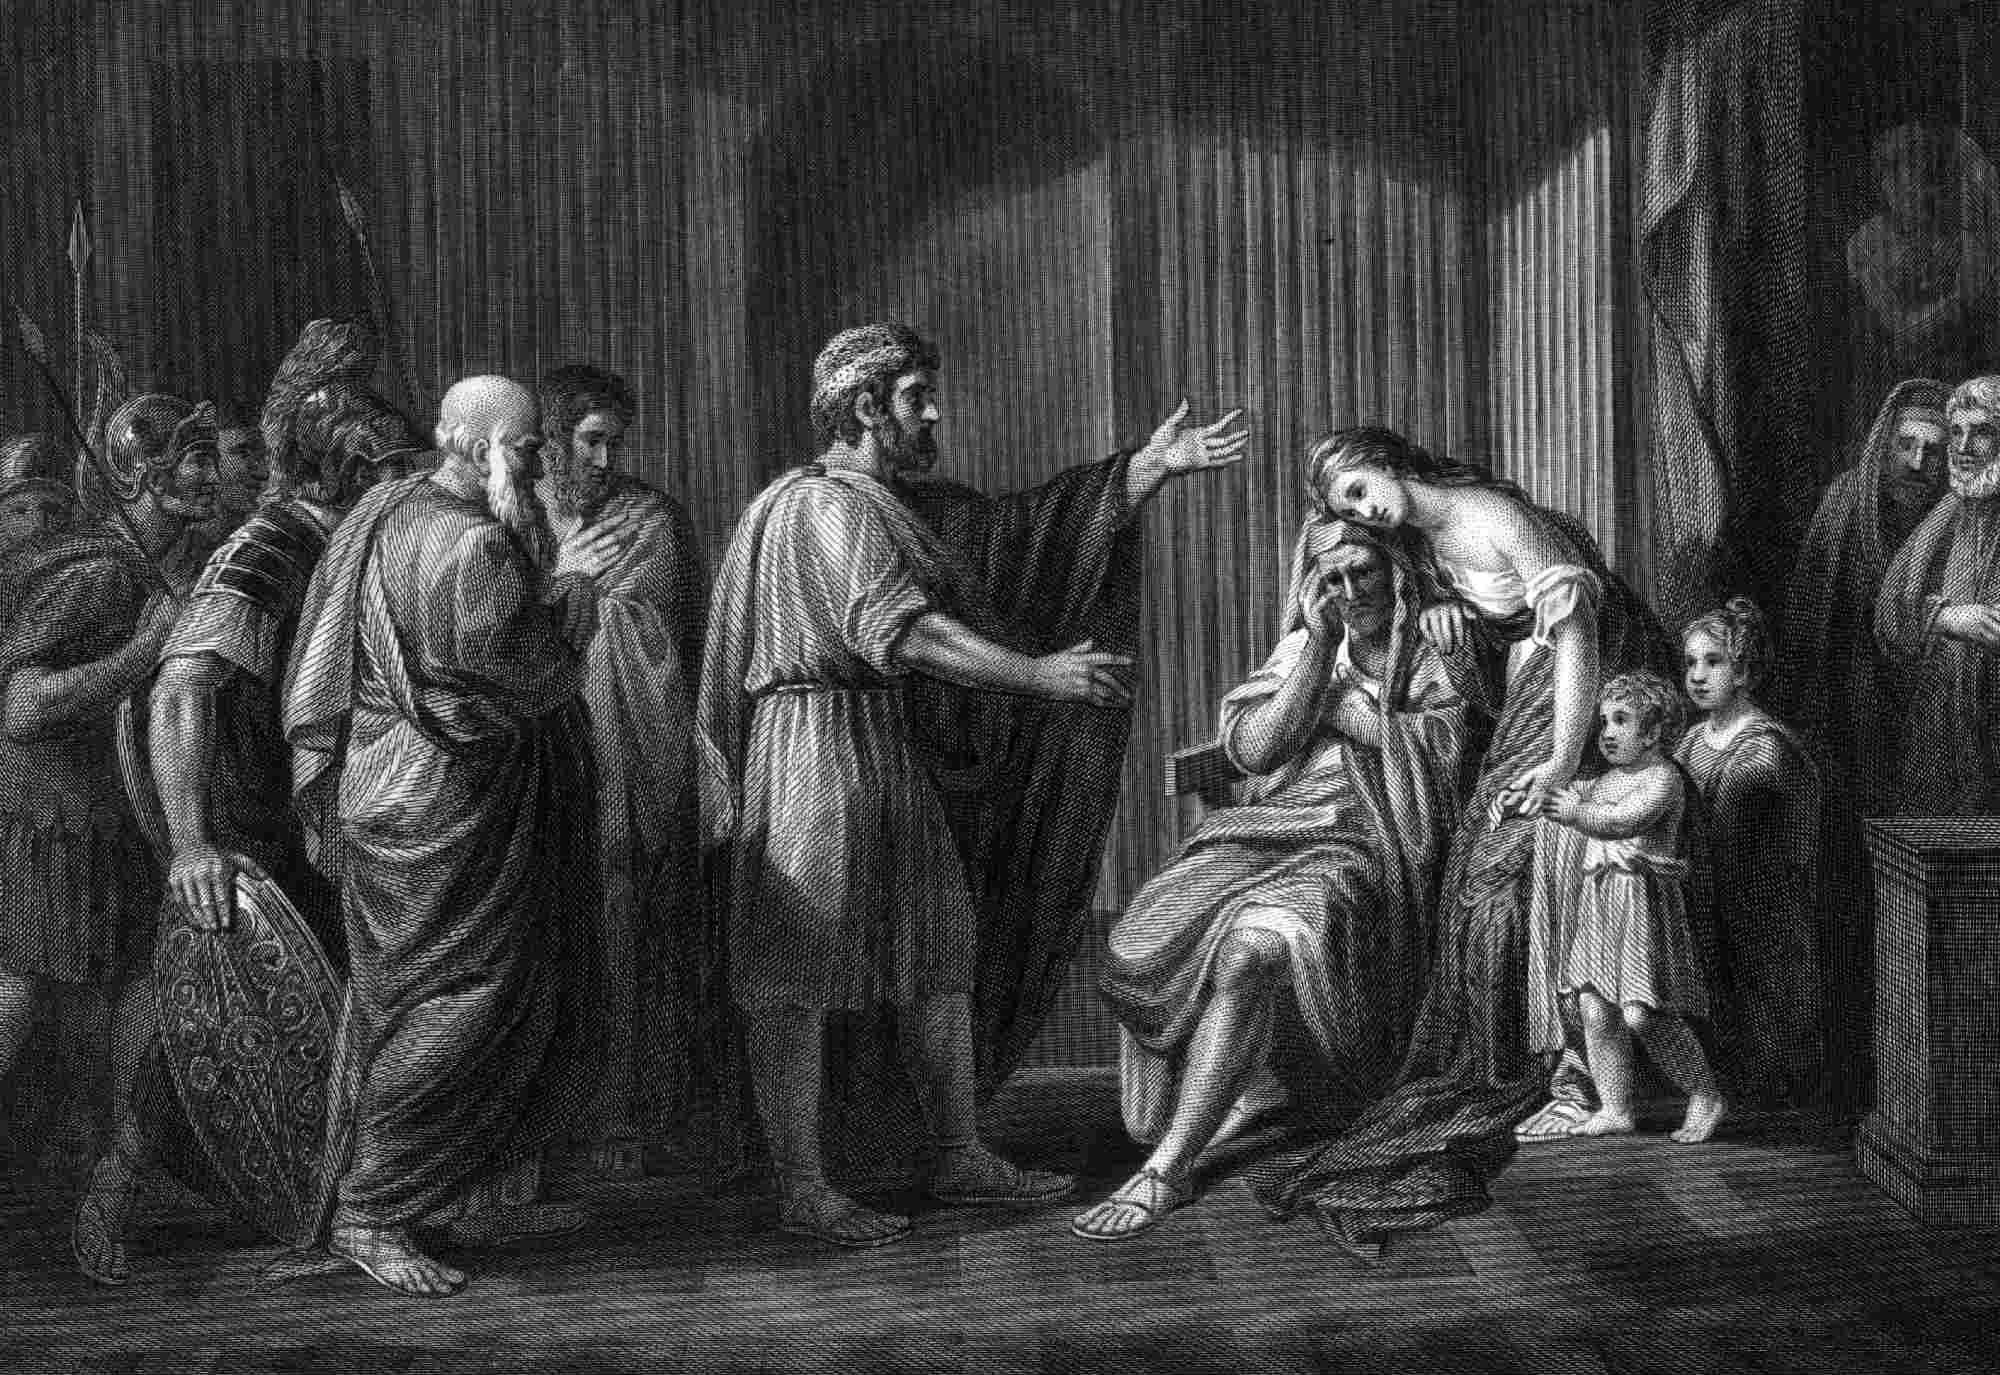 Cleombrotus, King of Sparta